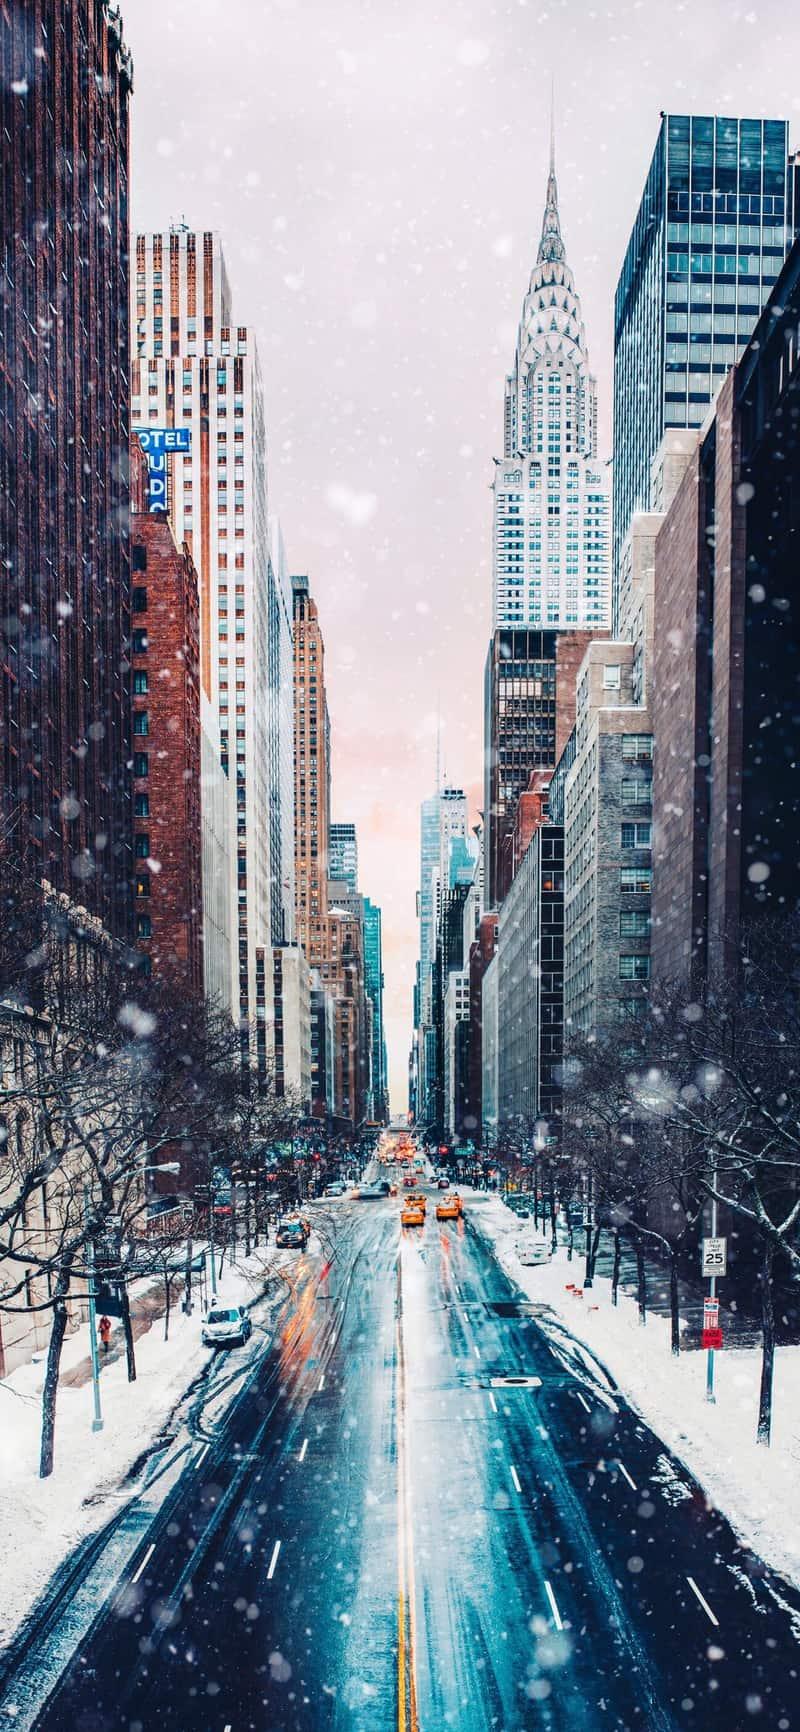 Winter Wallpaper iPad Christmas